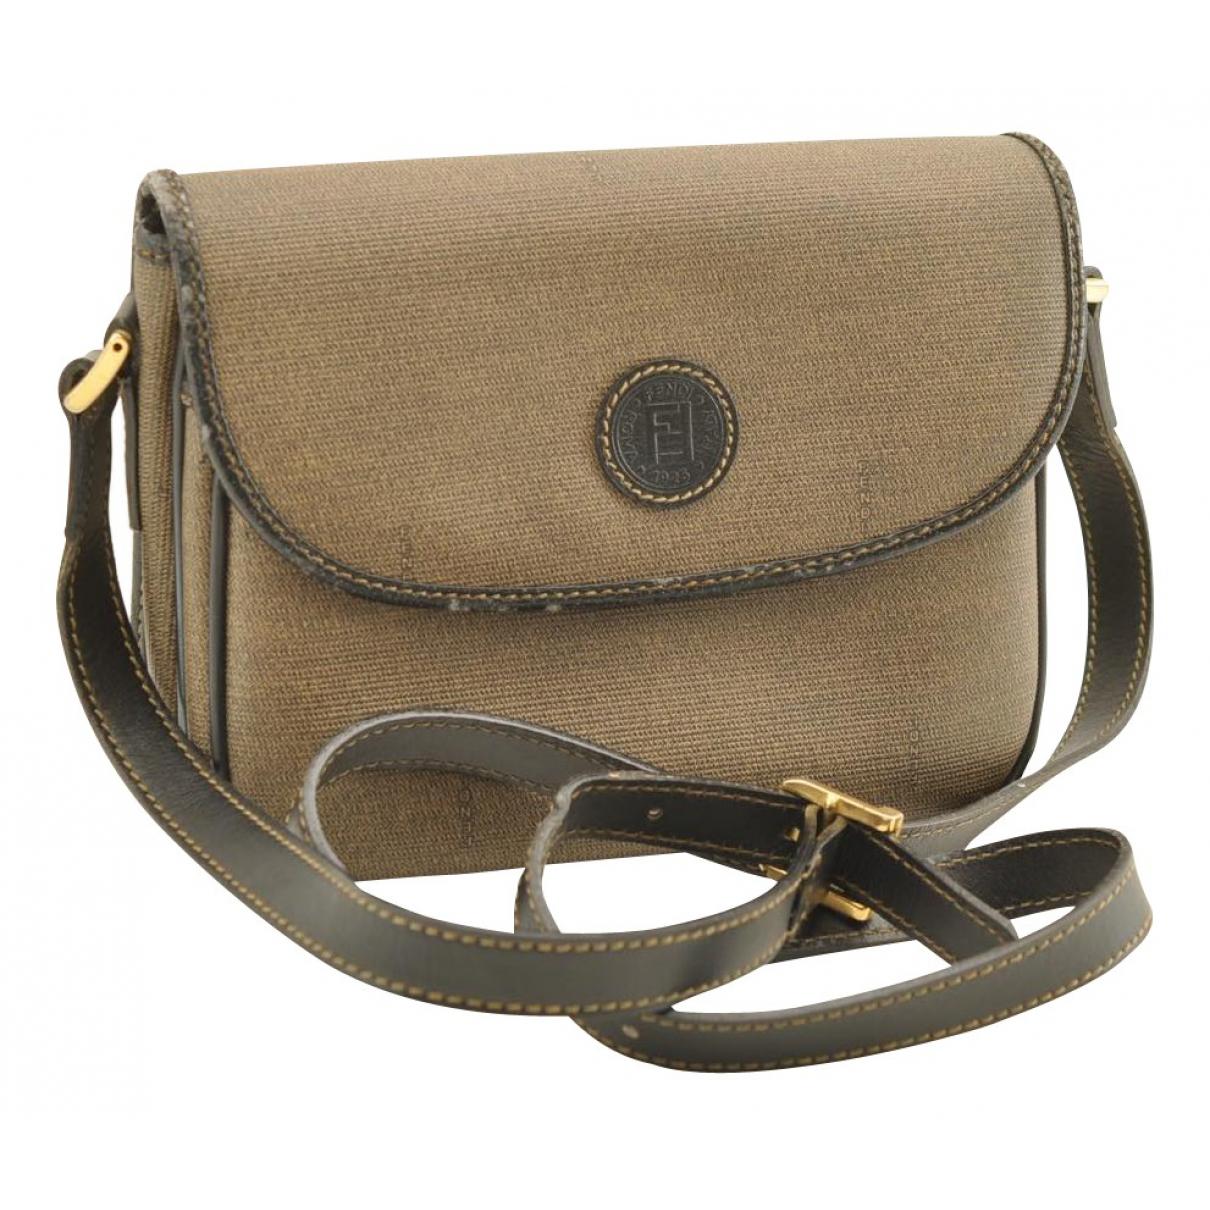 Fendi N Khaki Cloth handbag for Women N